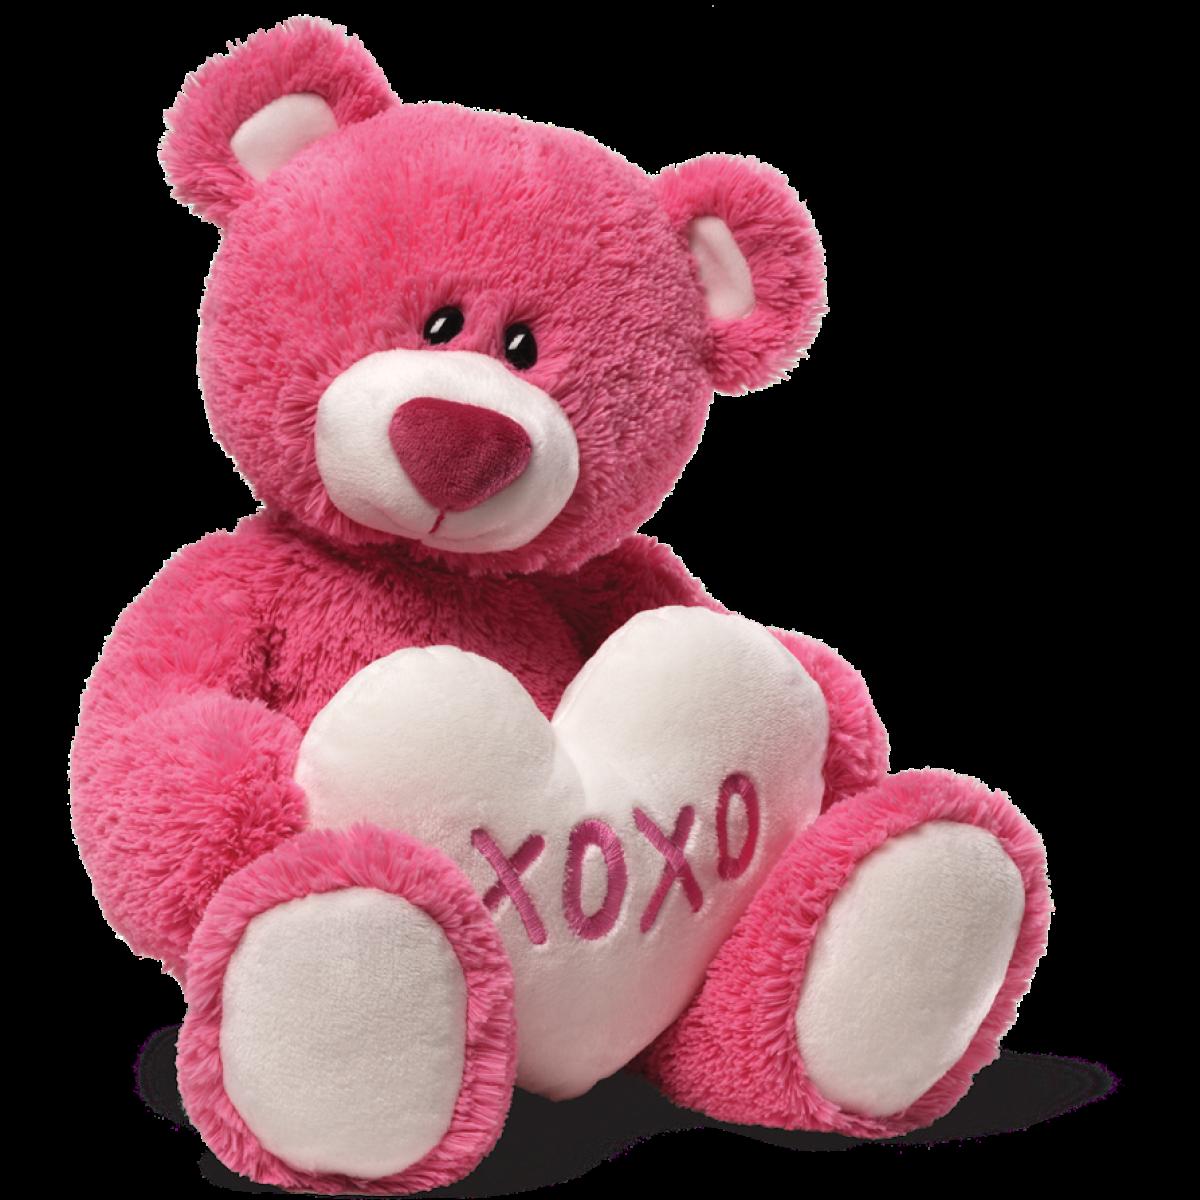 Download Teddy Bear Png Hd HQ PNG Image FreePNGImg